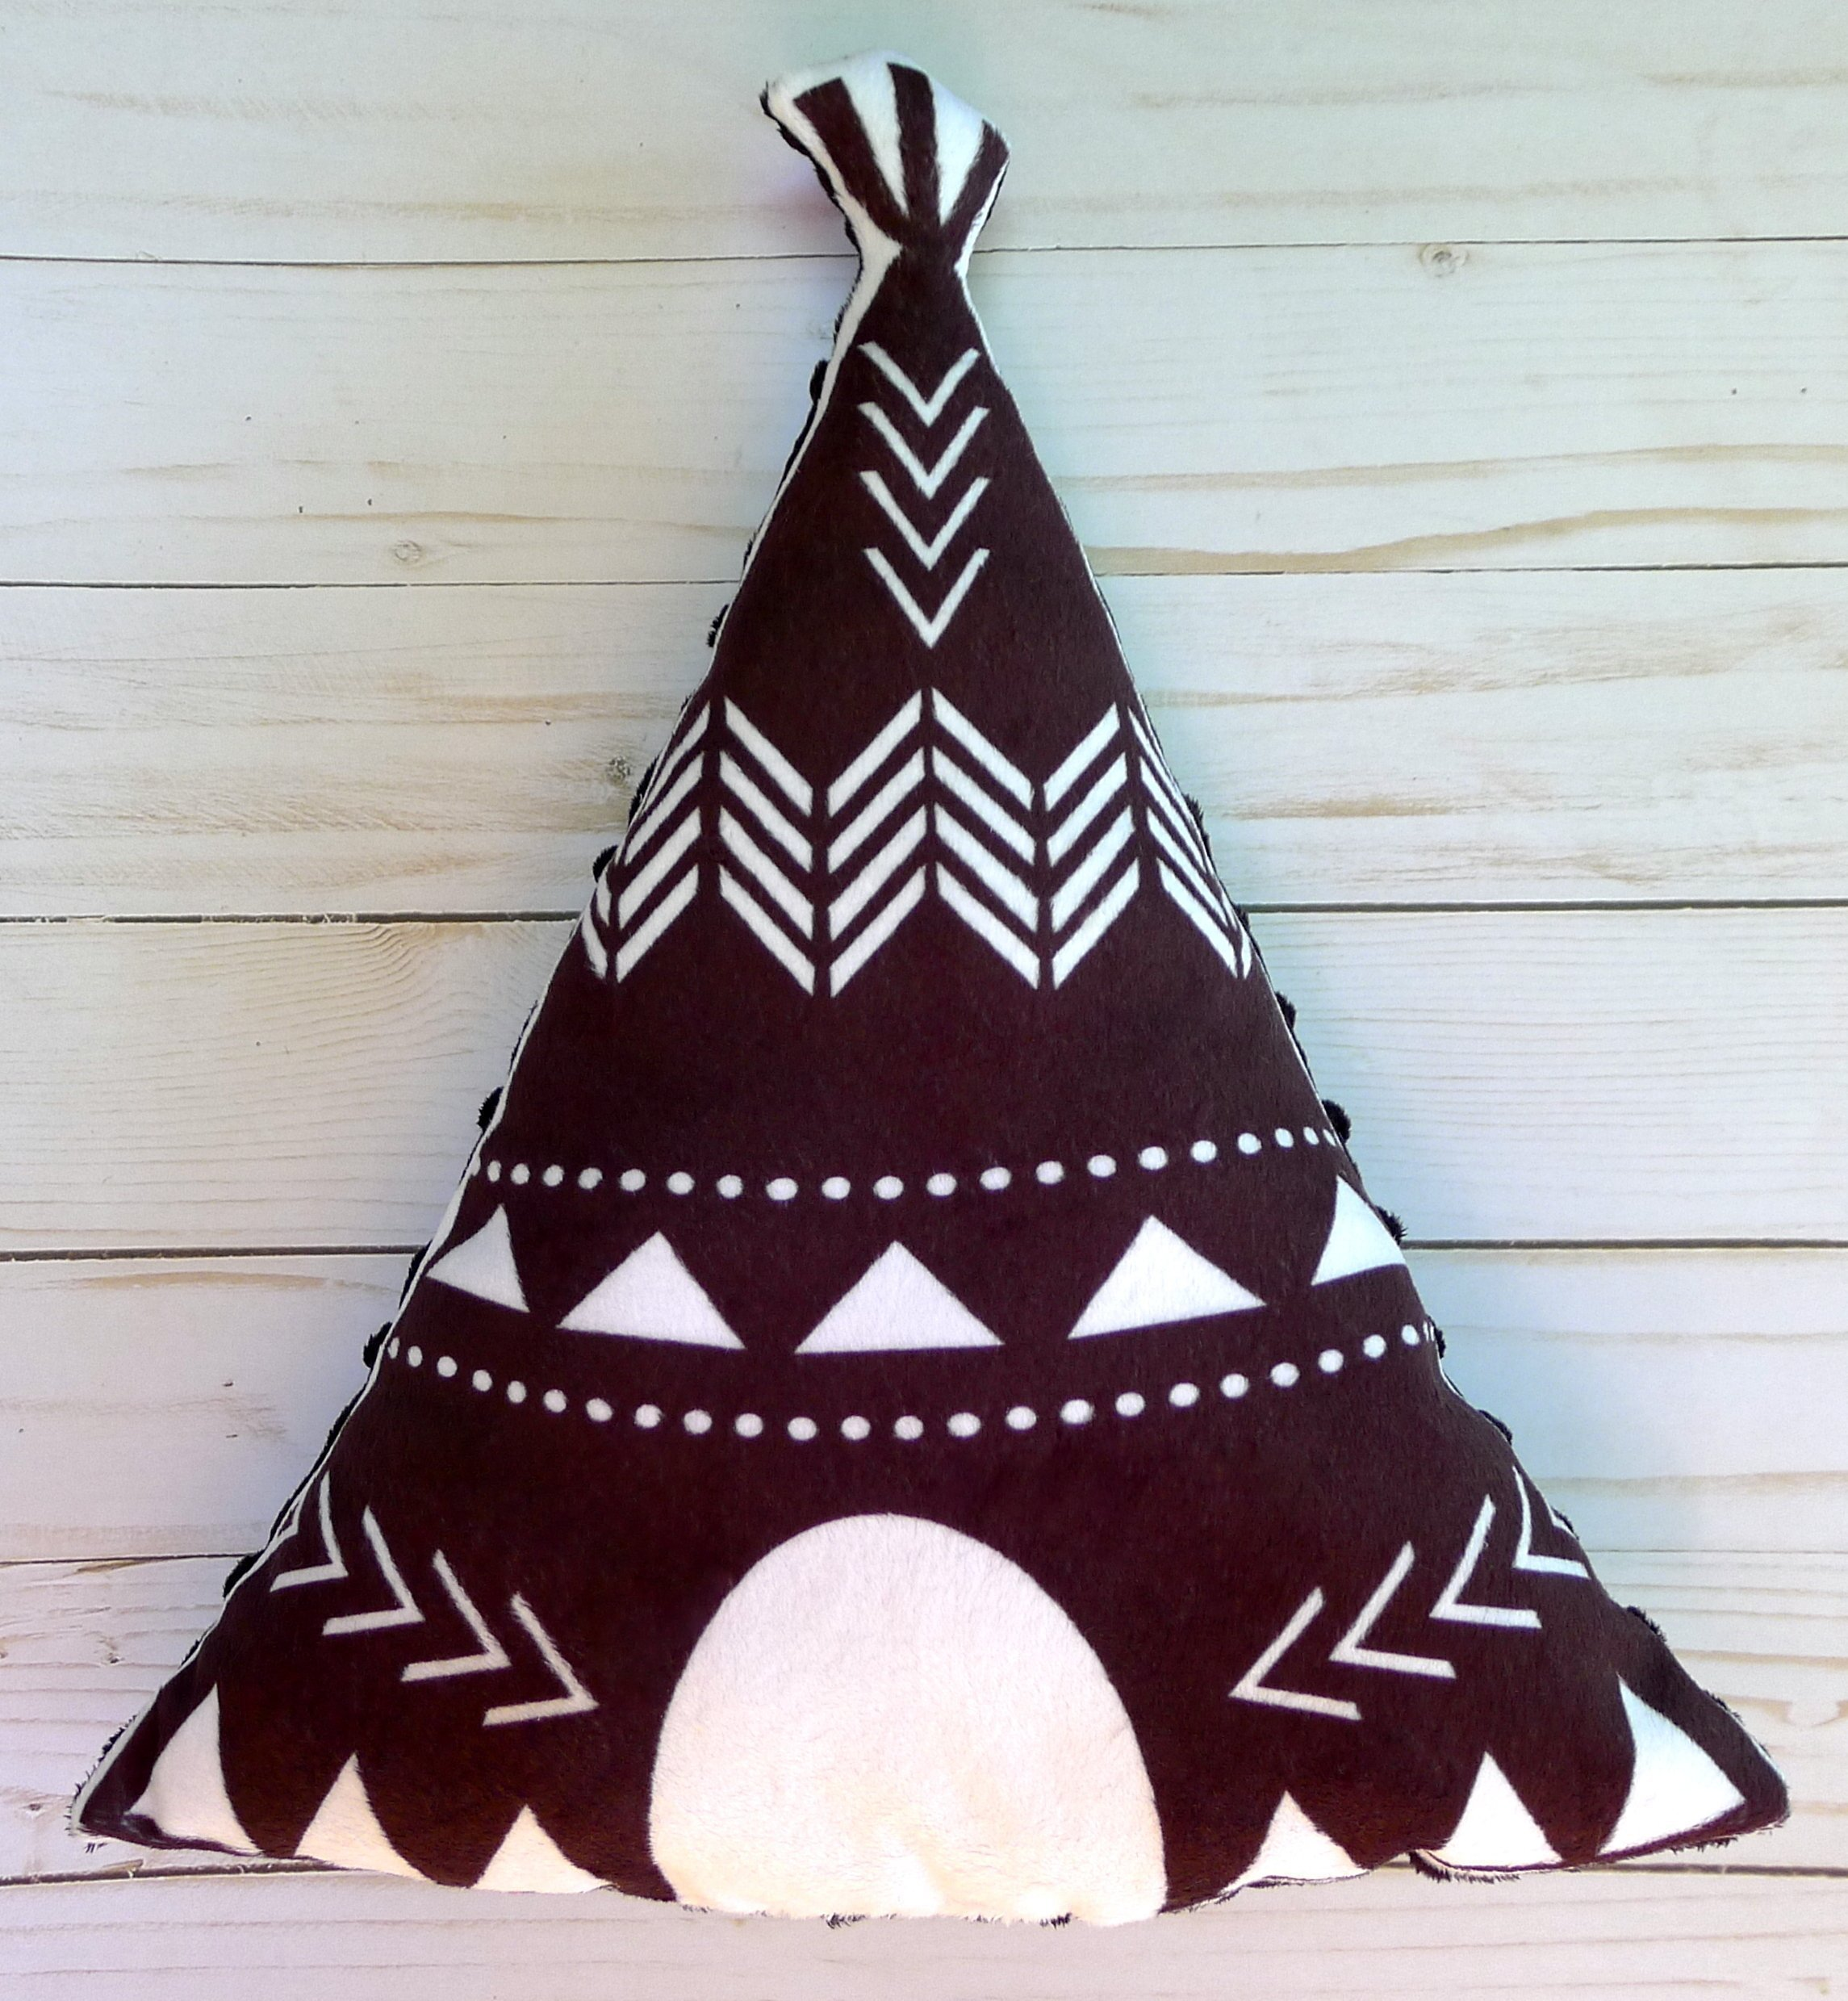 Minky Teepee Pillow - Decorative Nursery Pillow - Tribal Pillow - Tribal nursery decor - Nursery decor pillow - minky pillow - boho decor